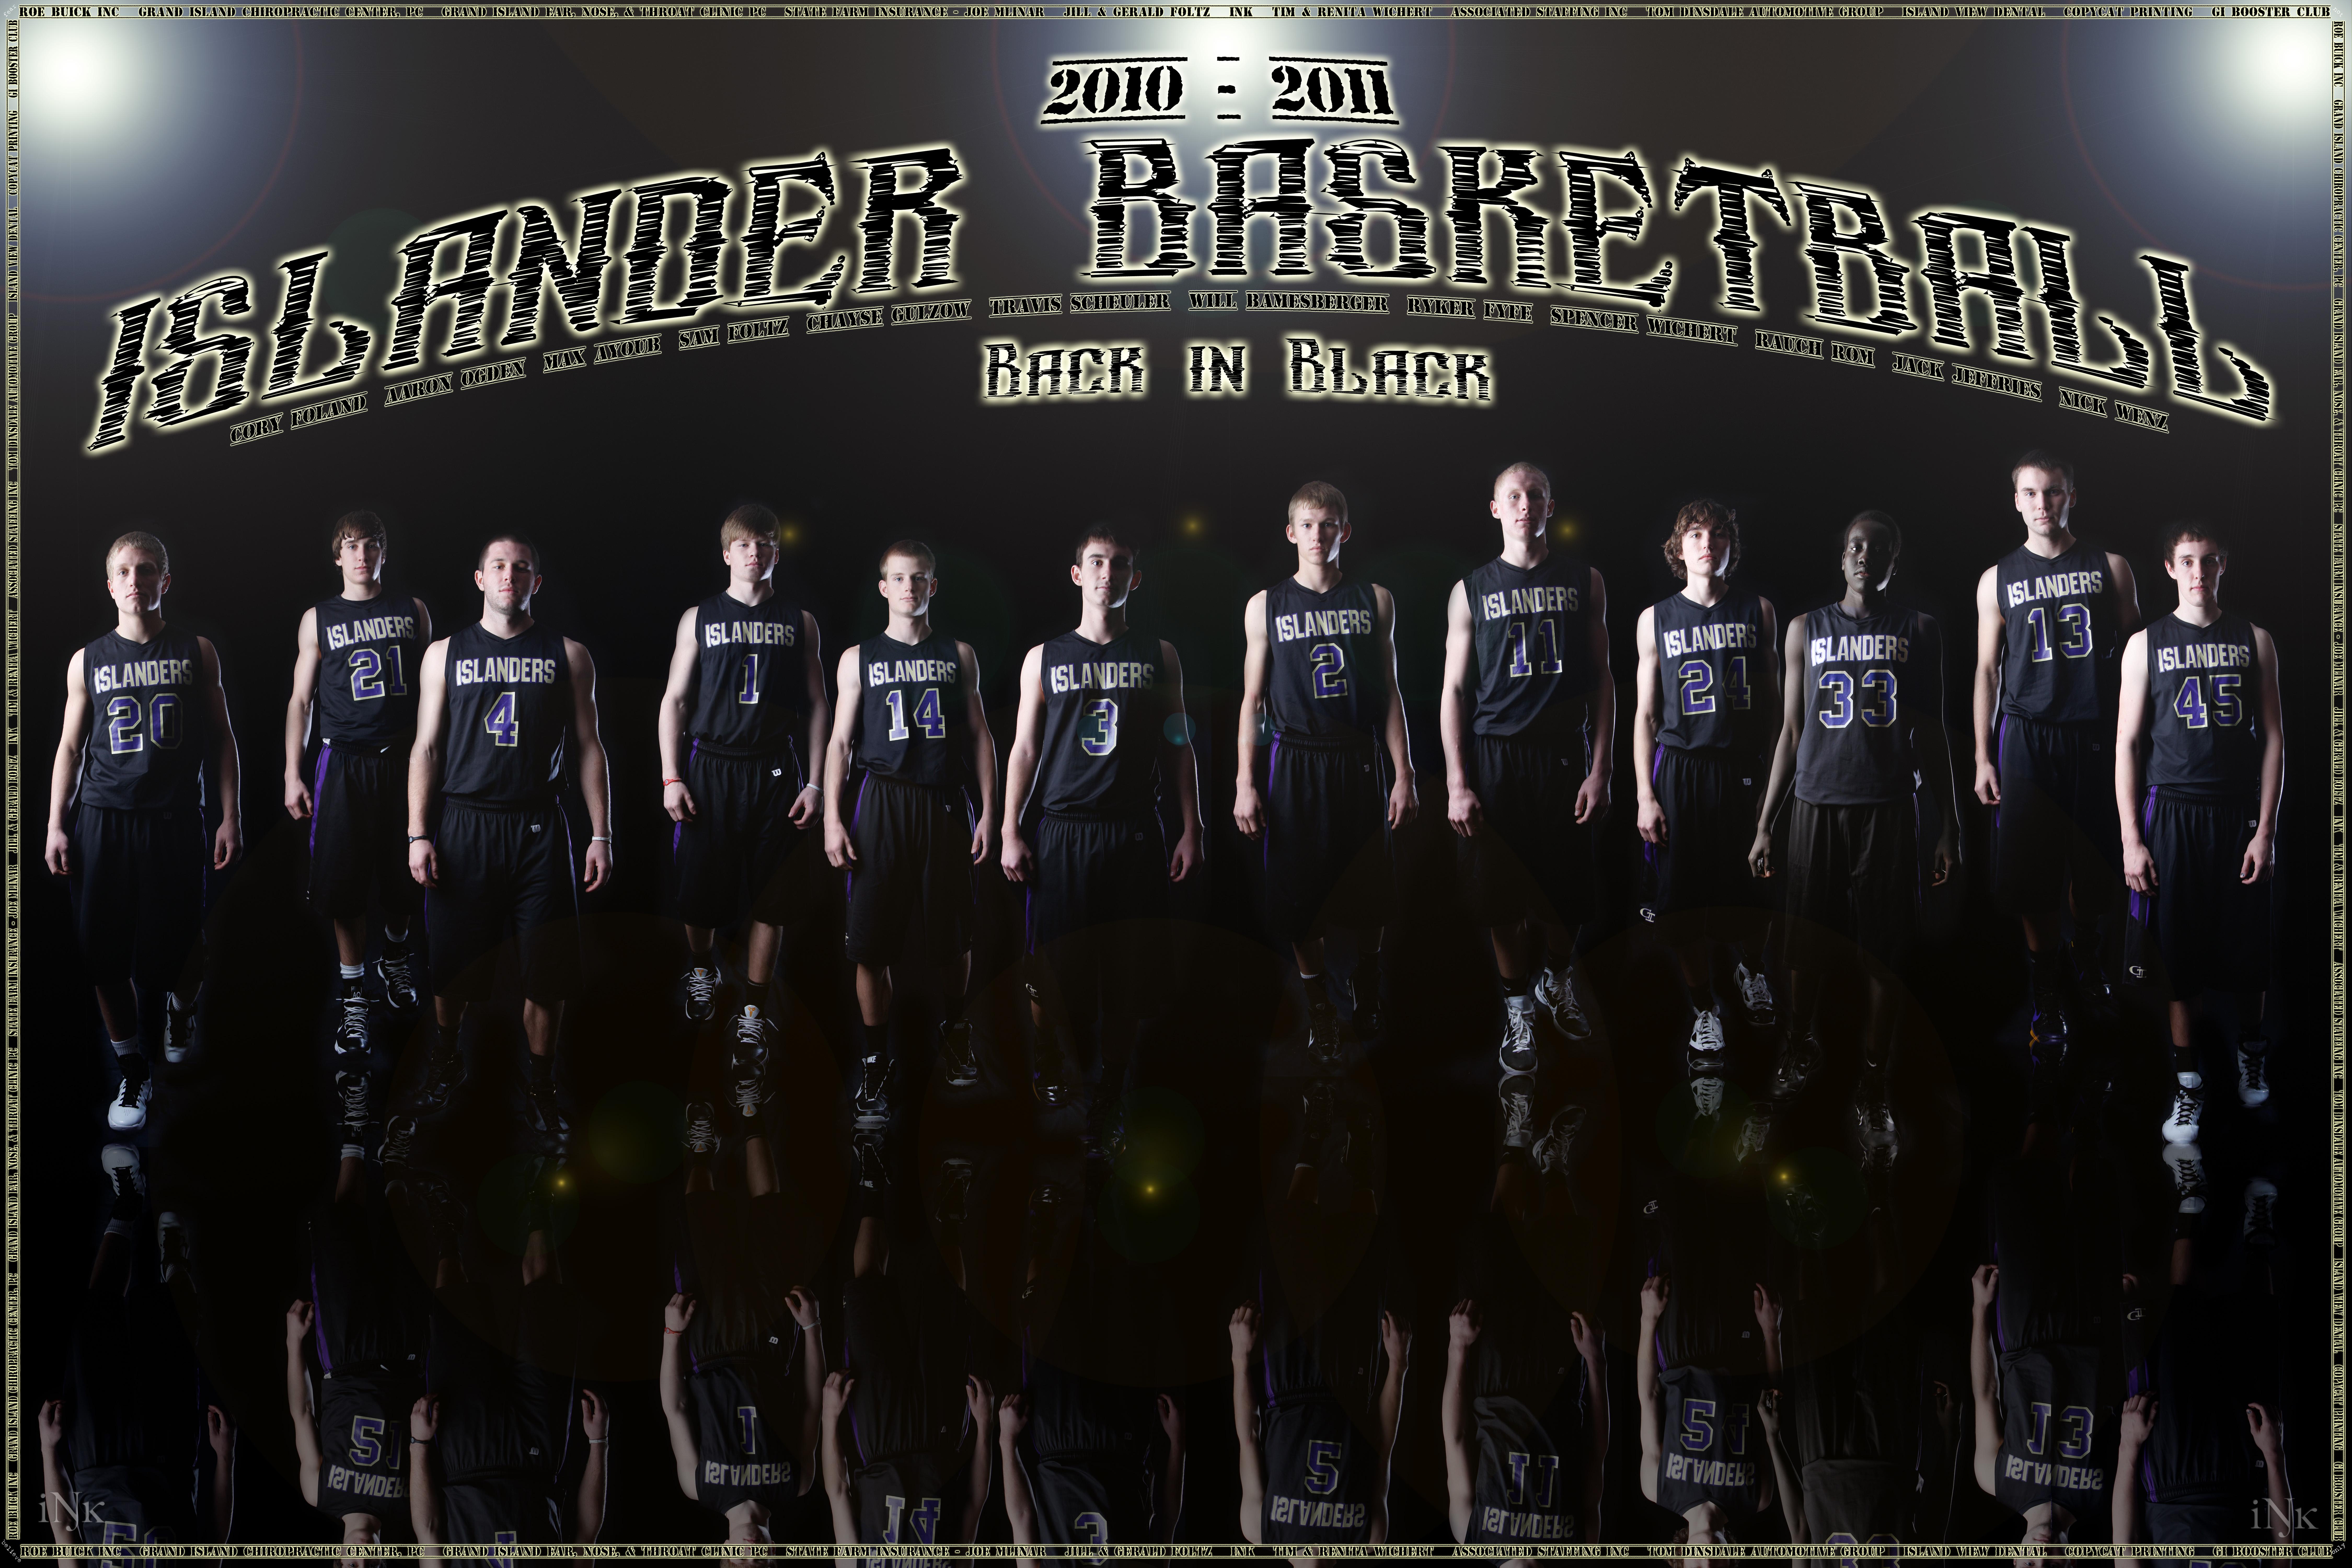 GISH Basketball Poster V1.3